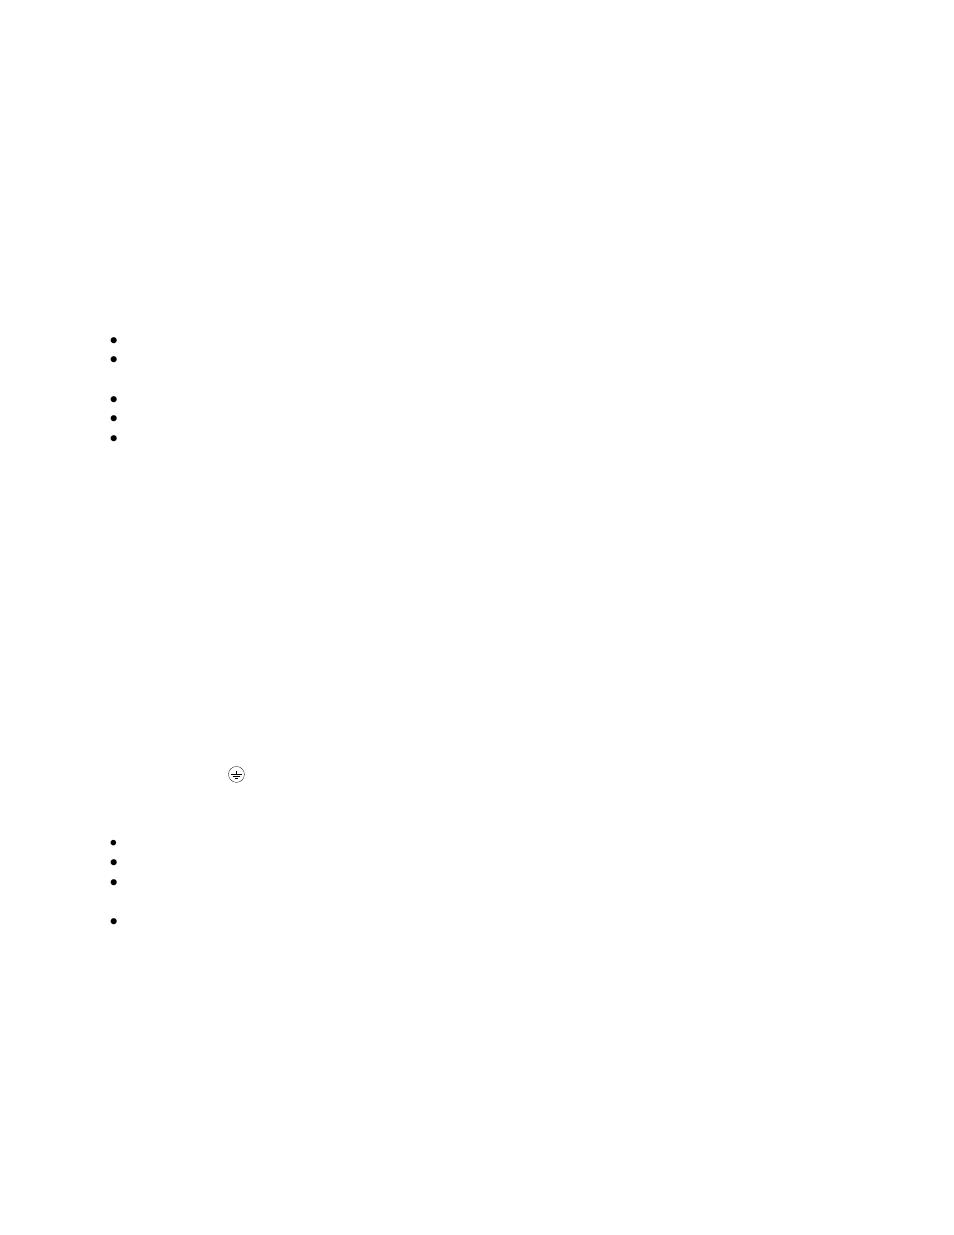 Ets User Manuals Conductor Circuit Board Kids Encyclopedia Children39s Homework Huawei Ets2555 Manual Array Hydac 1700 15 Pages Rh Manualsdir